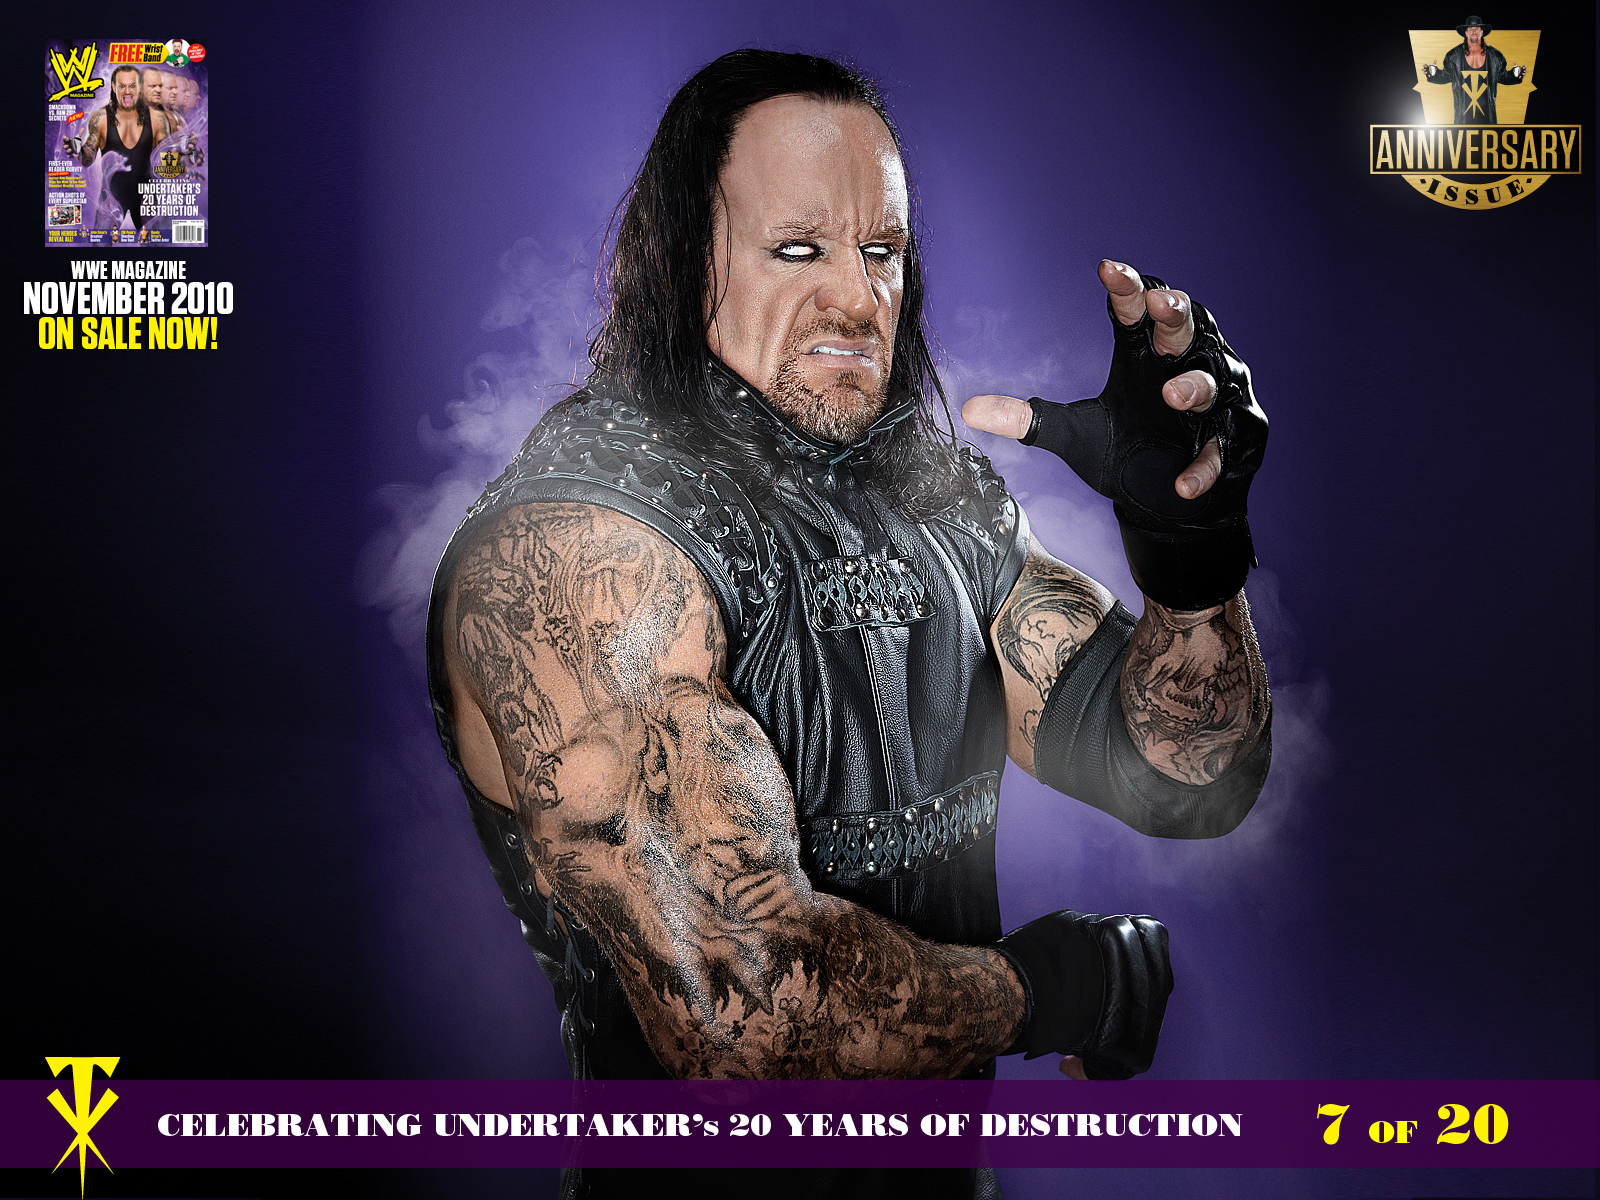 Undertaker-Wallpaper-undertaker-16273663-1600-1200 jpgUndertaker Wallpaper 2012